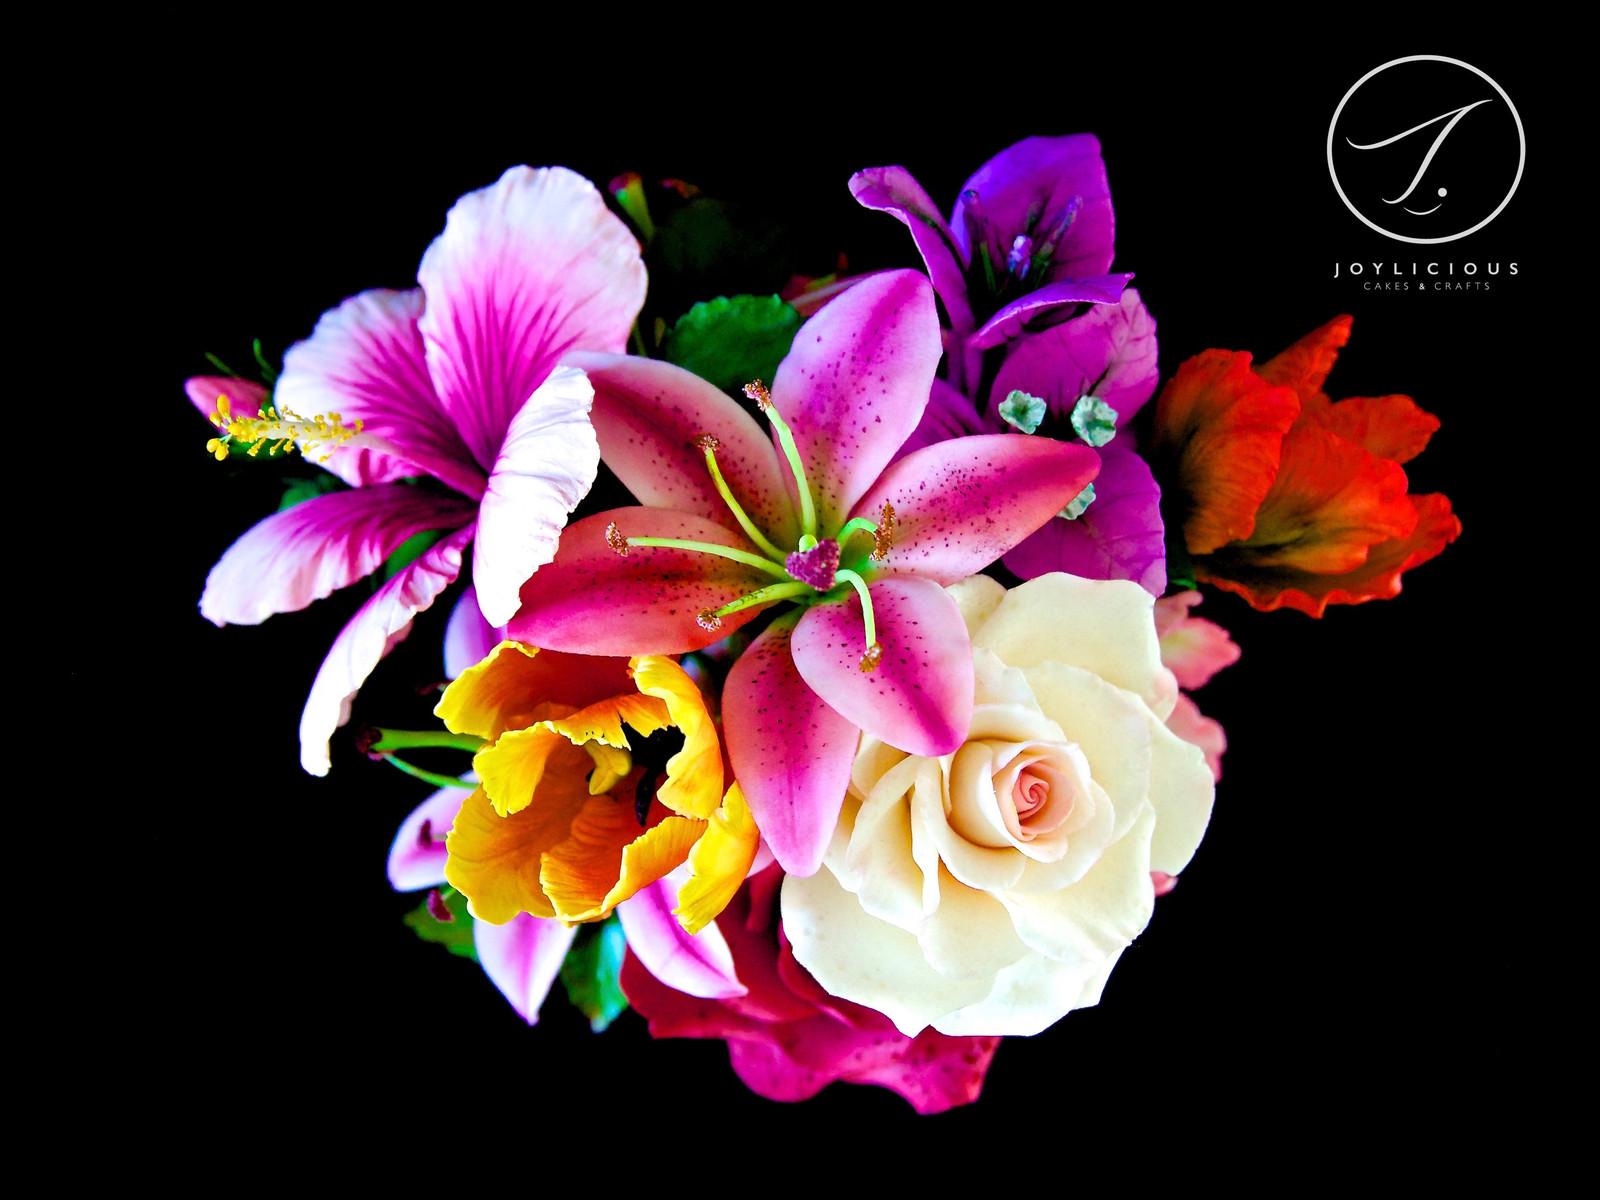 Sugar flowers joylicious cakes and crafts sugar assorted posy izmirmasajfo